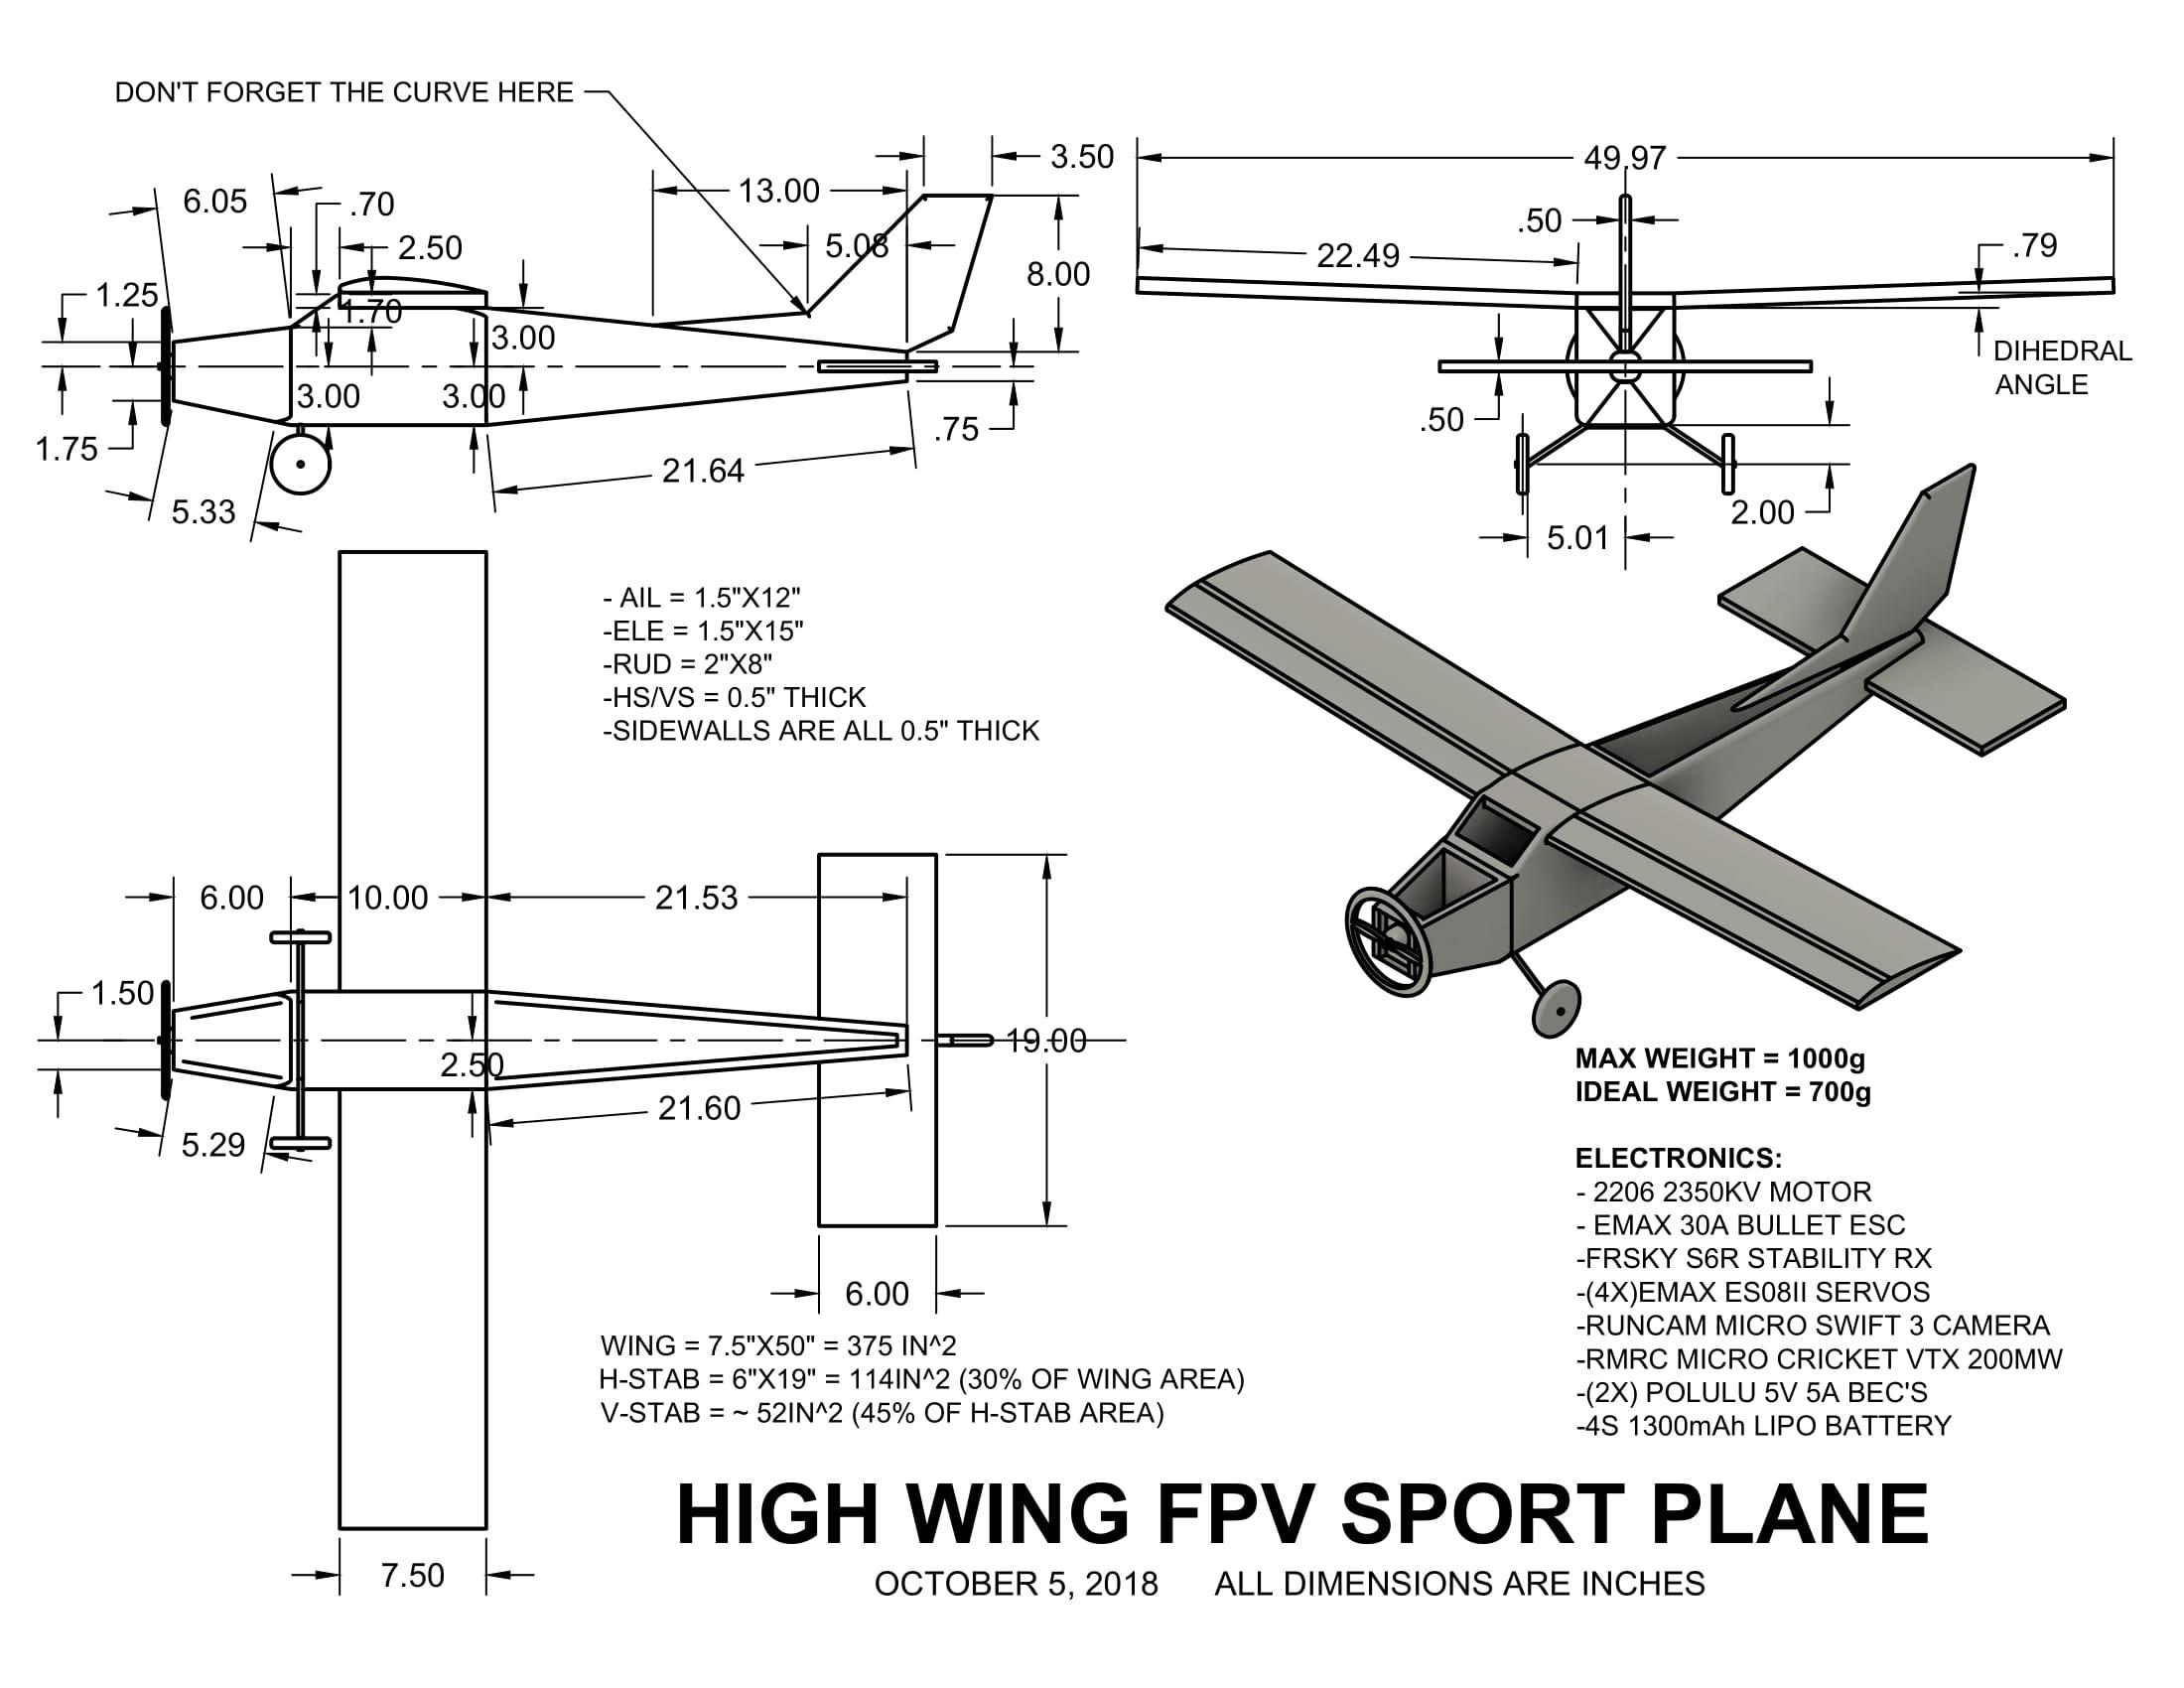 cessna 406 diagram home theater speaker wiring bush plane schematic simple site hatchet crash scratch built fpv flite